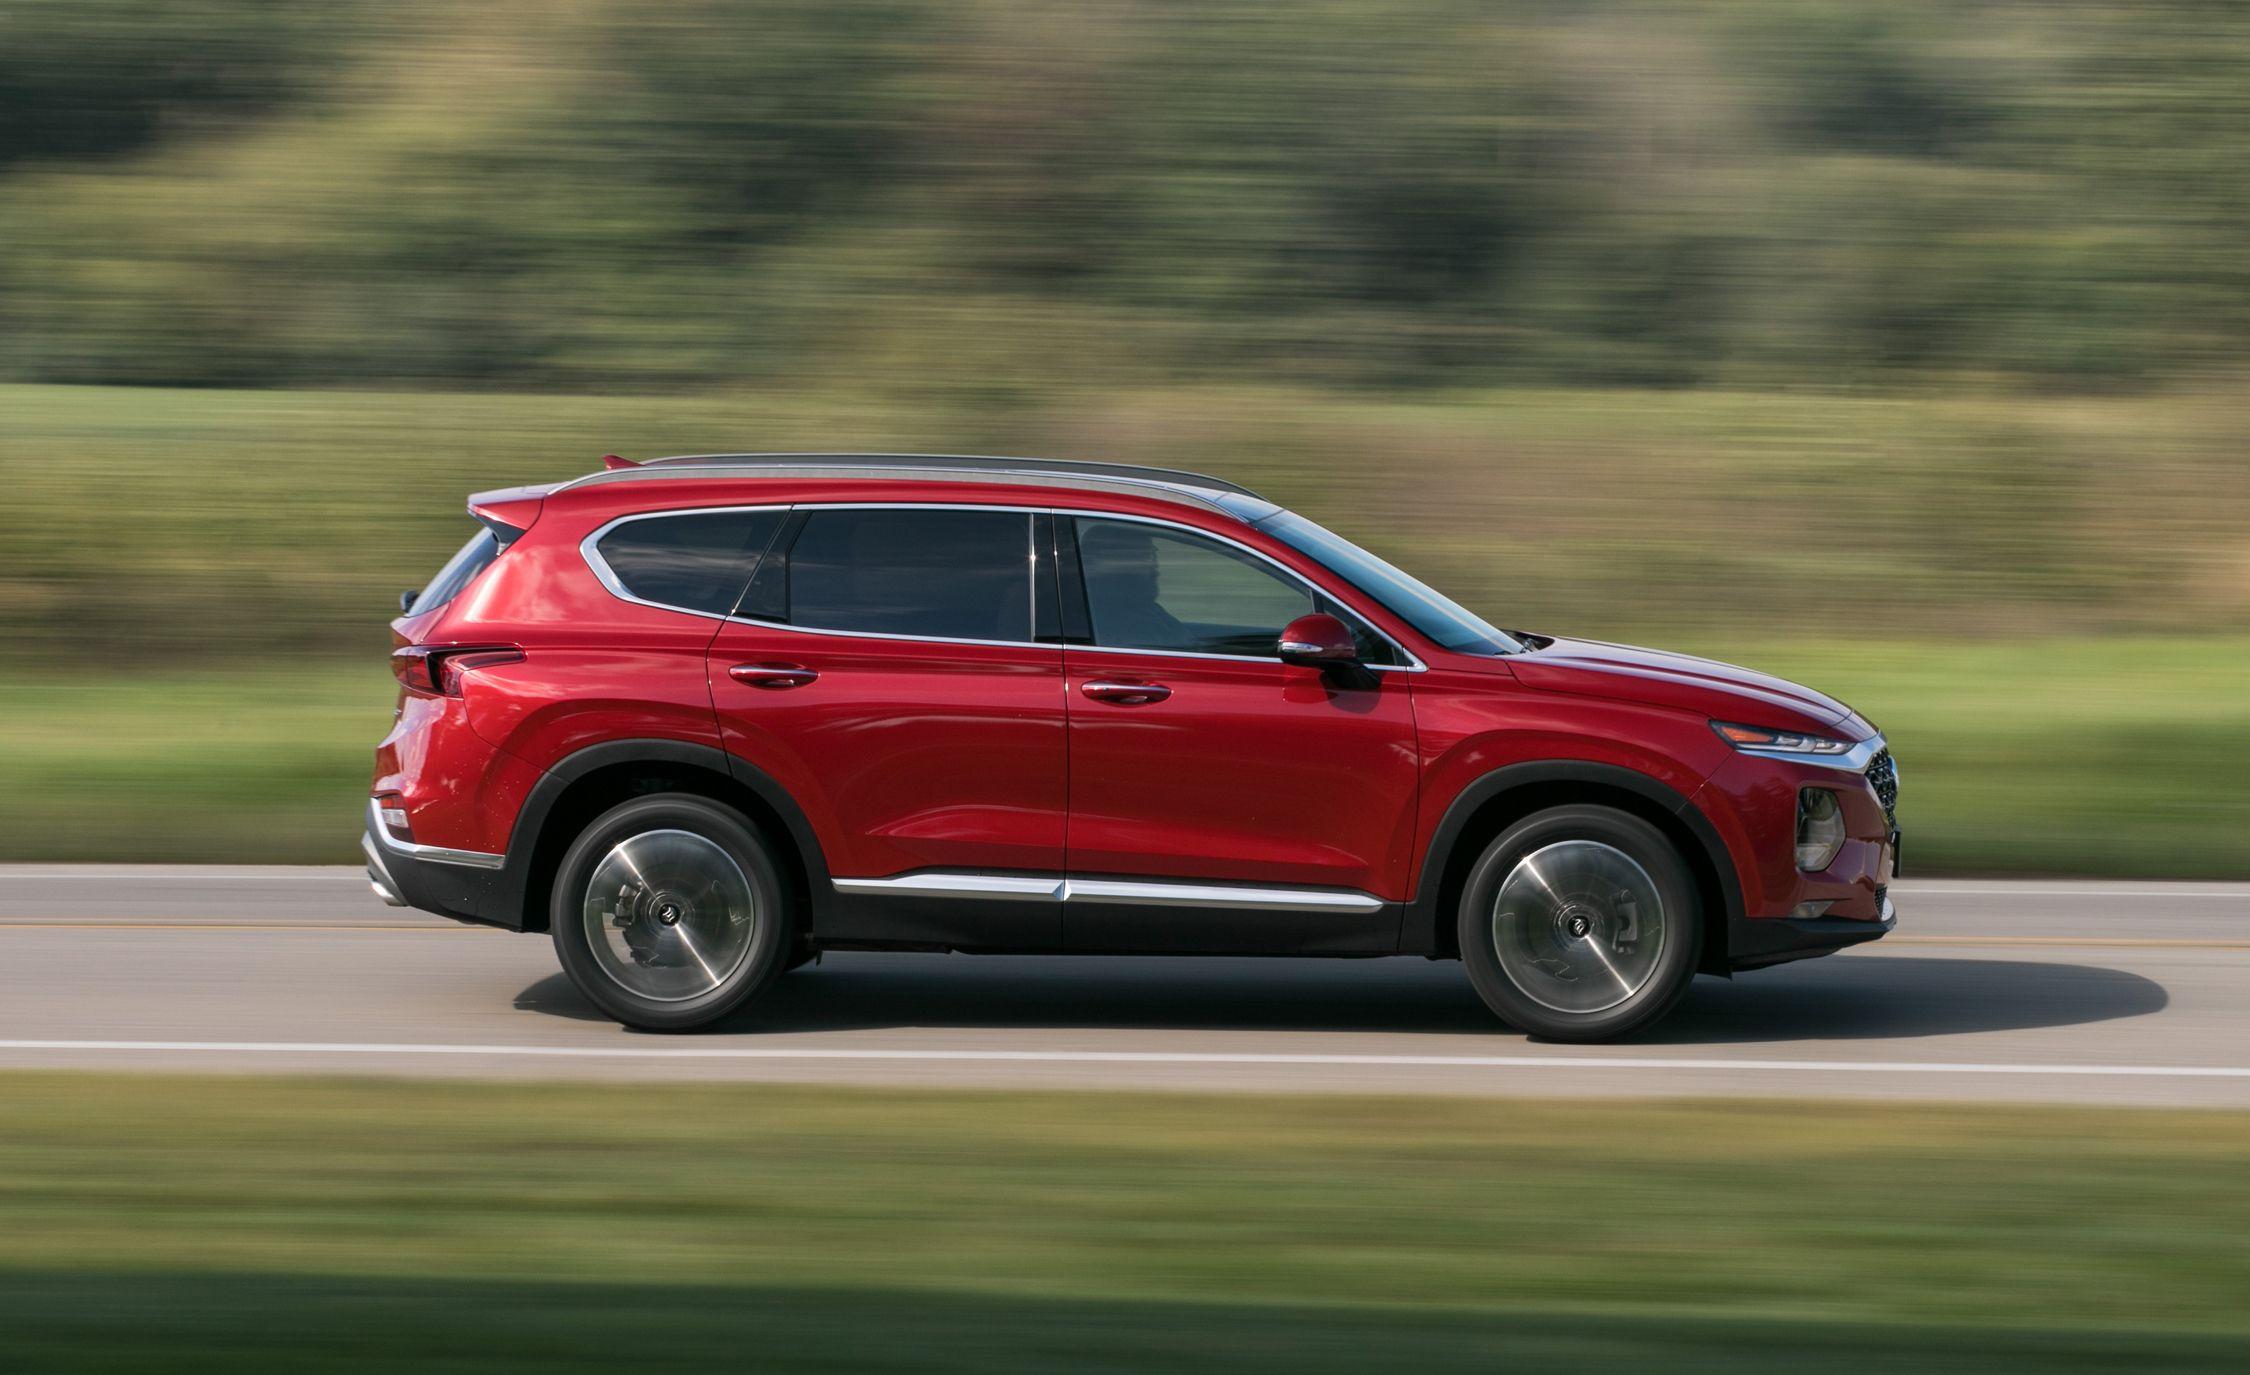 2019 Hyundai Santa Fe Loses The Sport Keeps Practicality